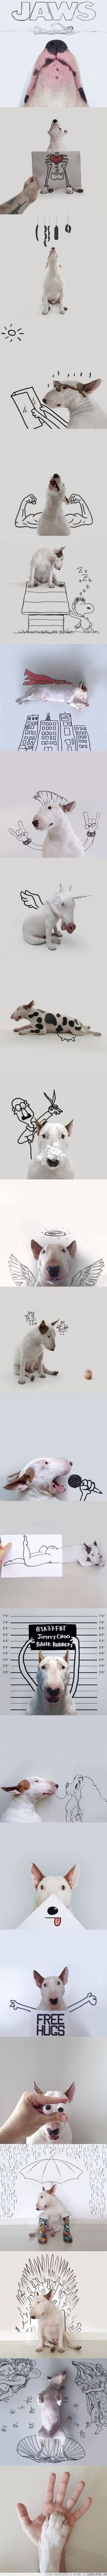 ¡Mi mascota es tan artista como yo!